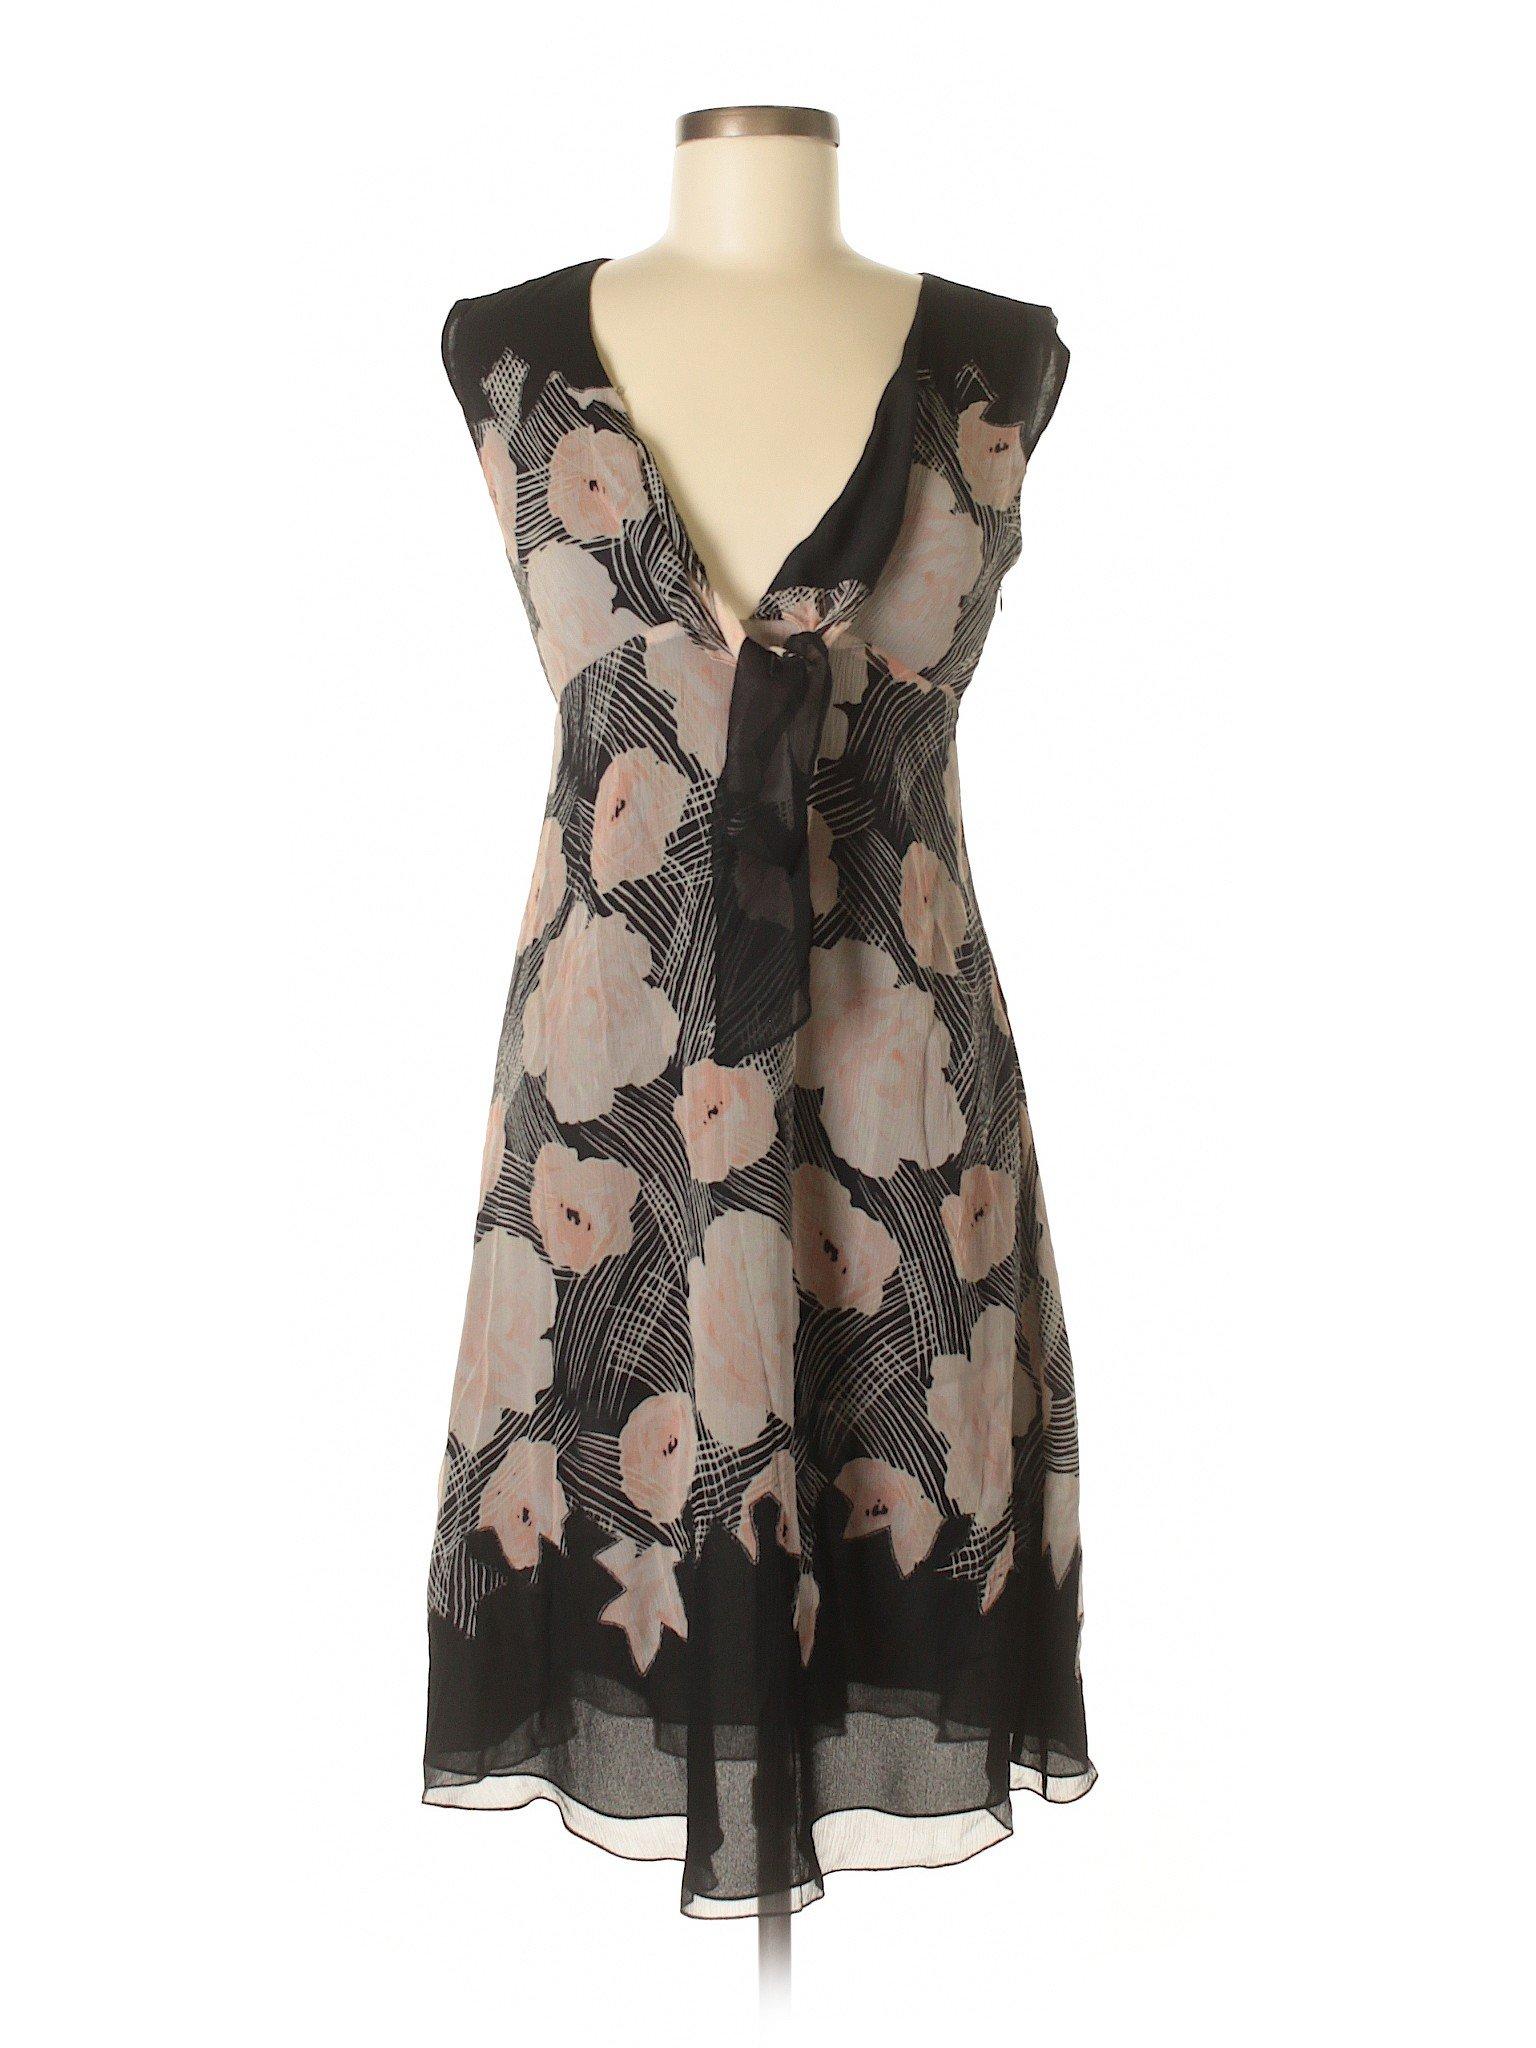 Linda Allard Tracy Casual Ellen Dress Boutique winter SqnHE5